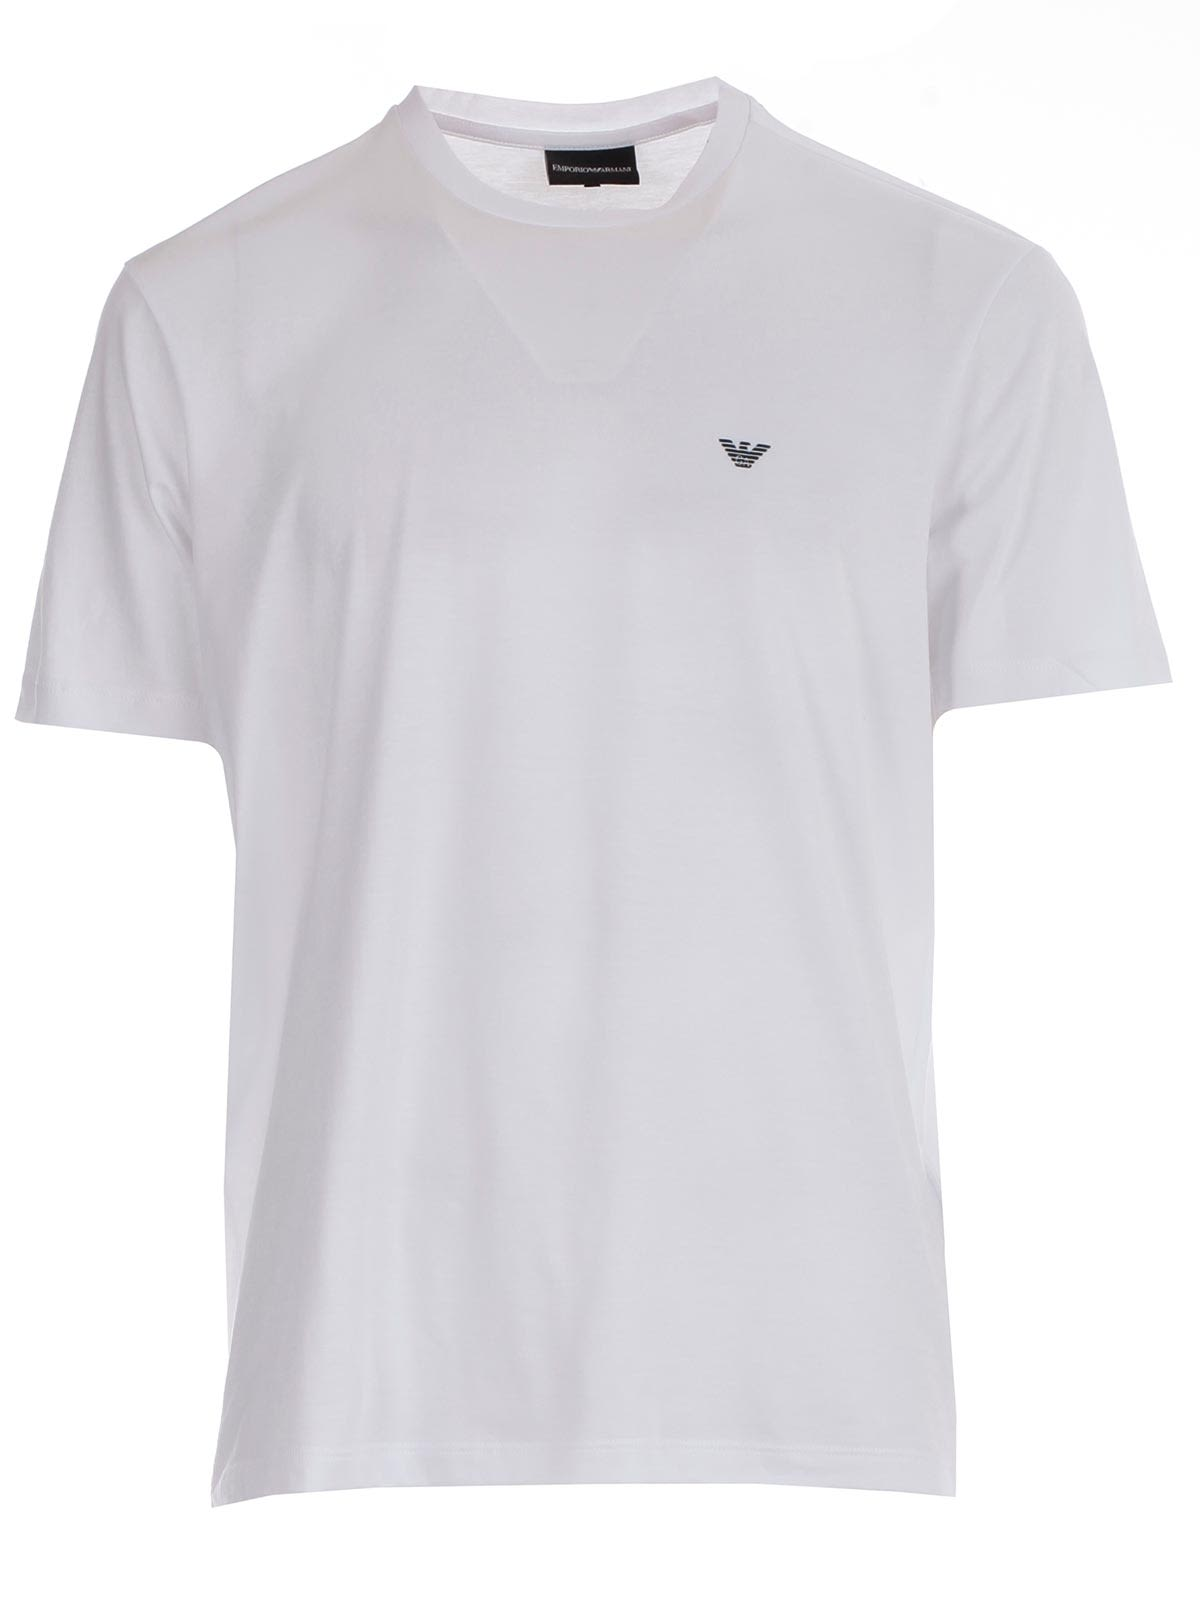 f2b1012f Emporio Armani Emporio Armani Logo T-shirt - Optical White ...